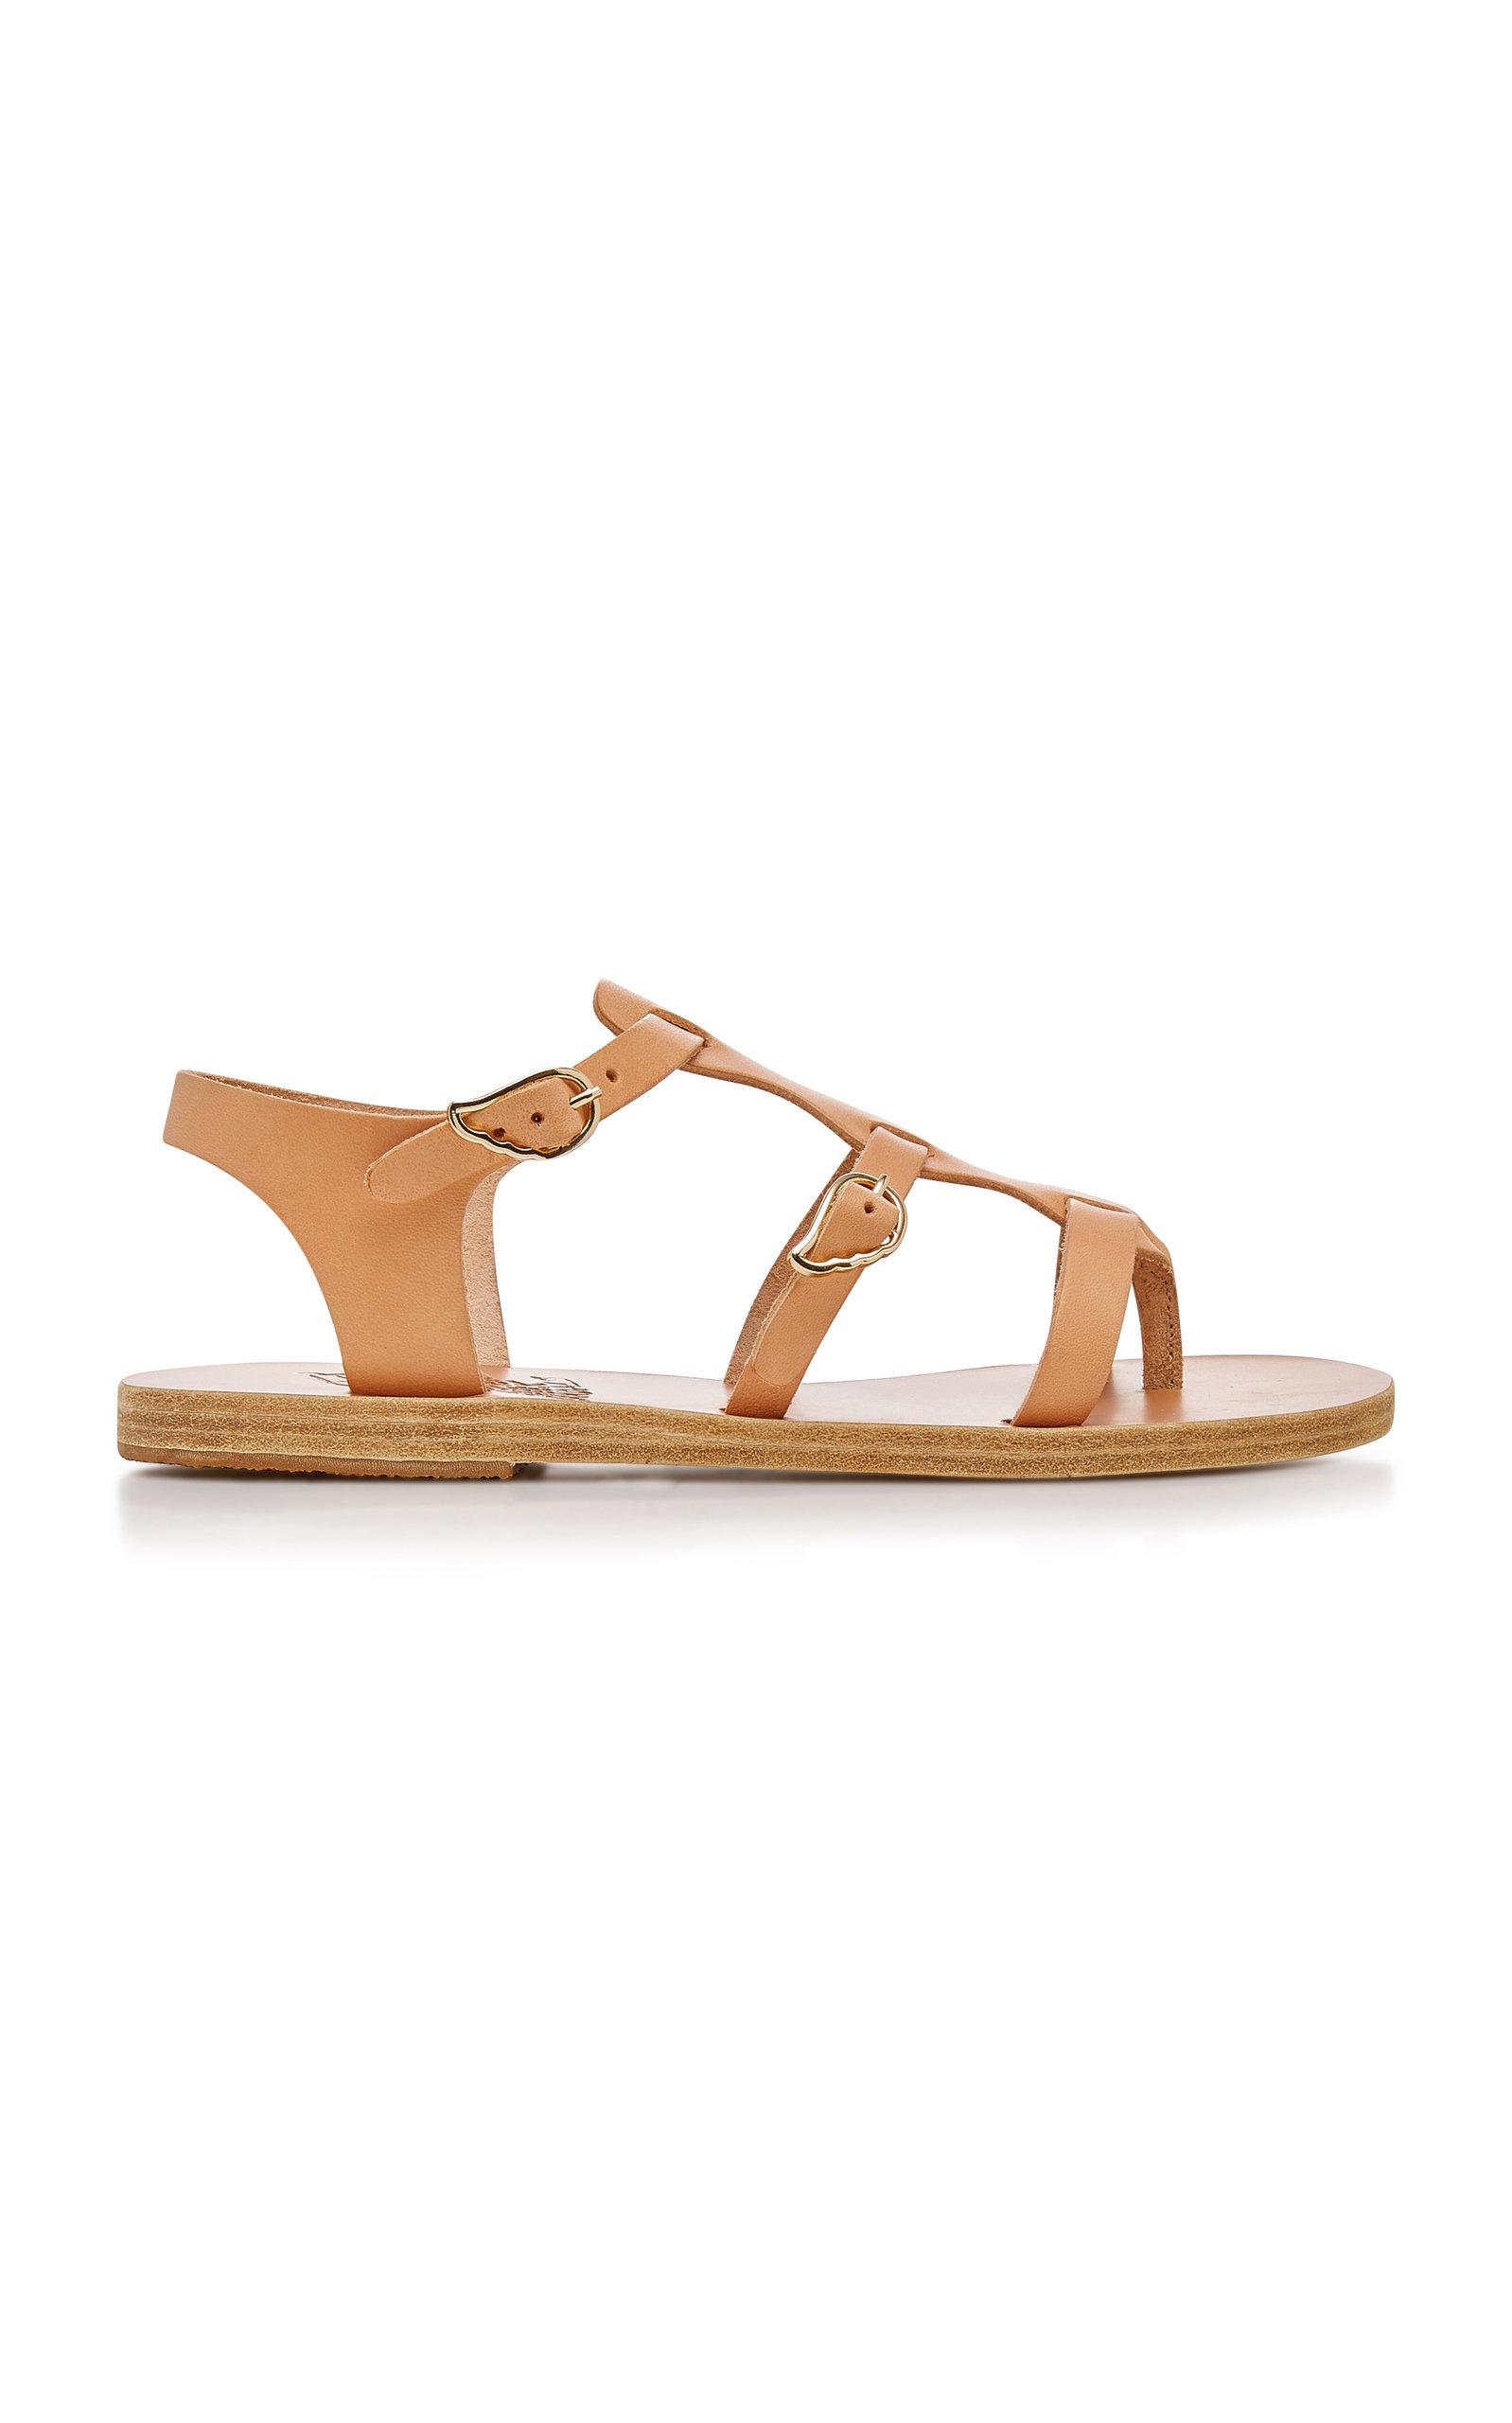 eb79b72a3 Women s Ancient Greek Sandals